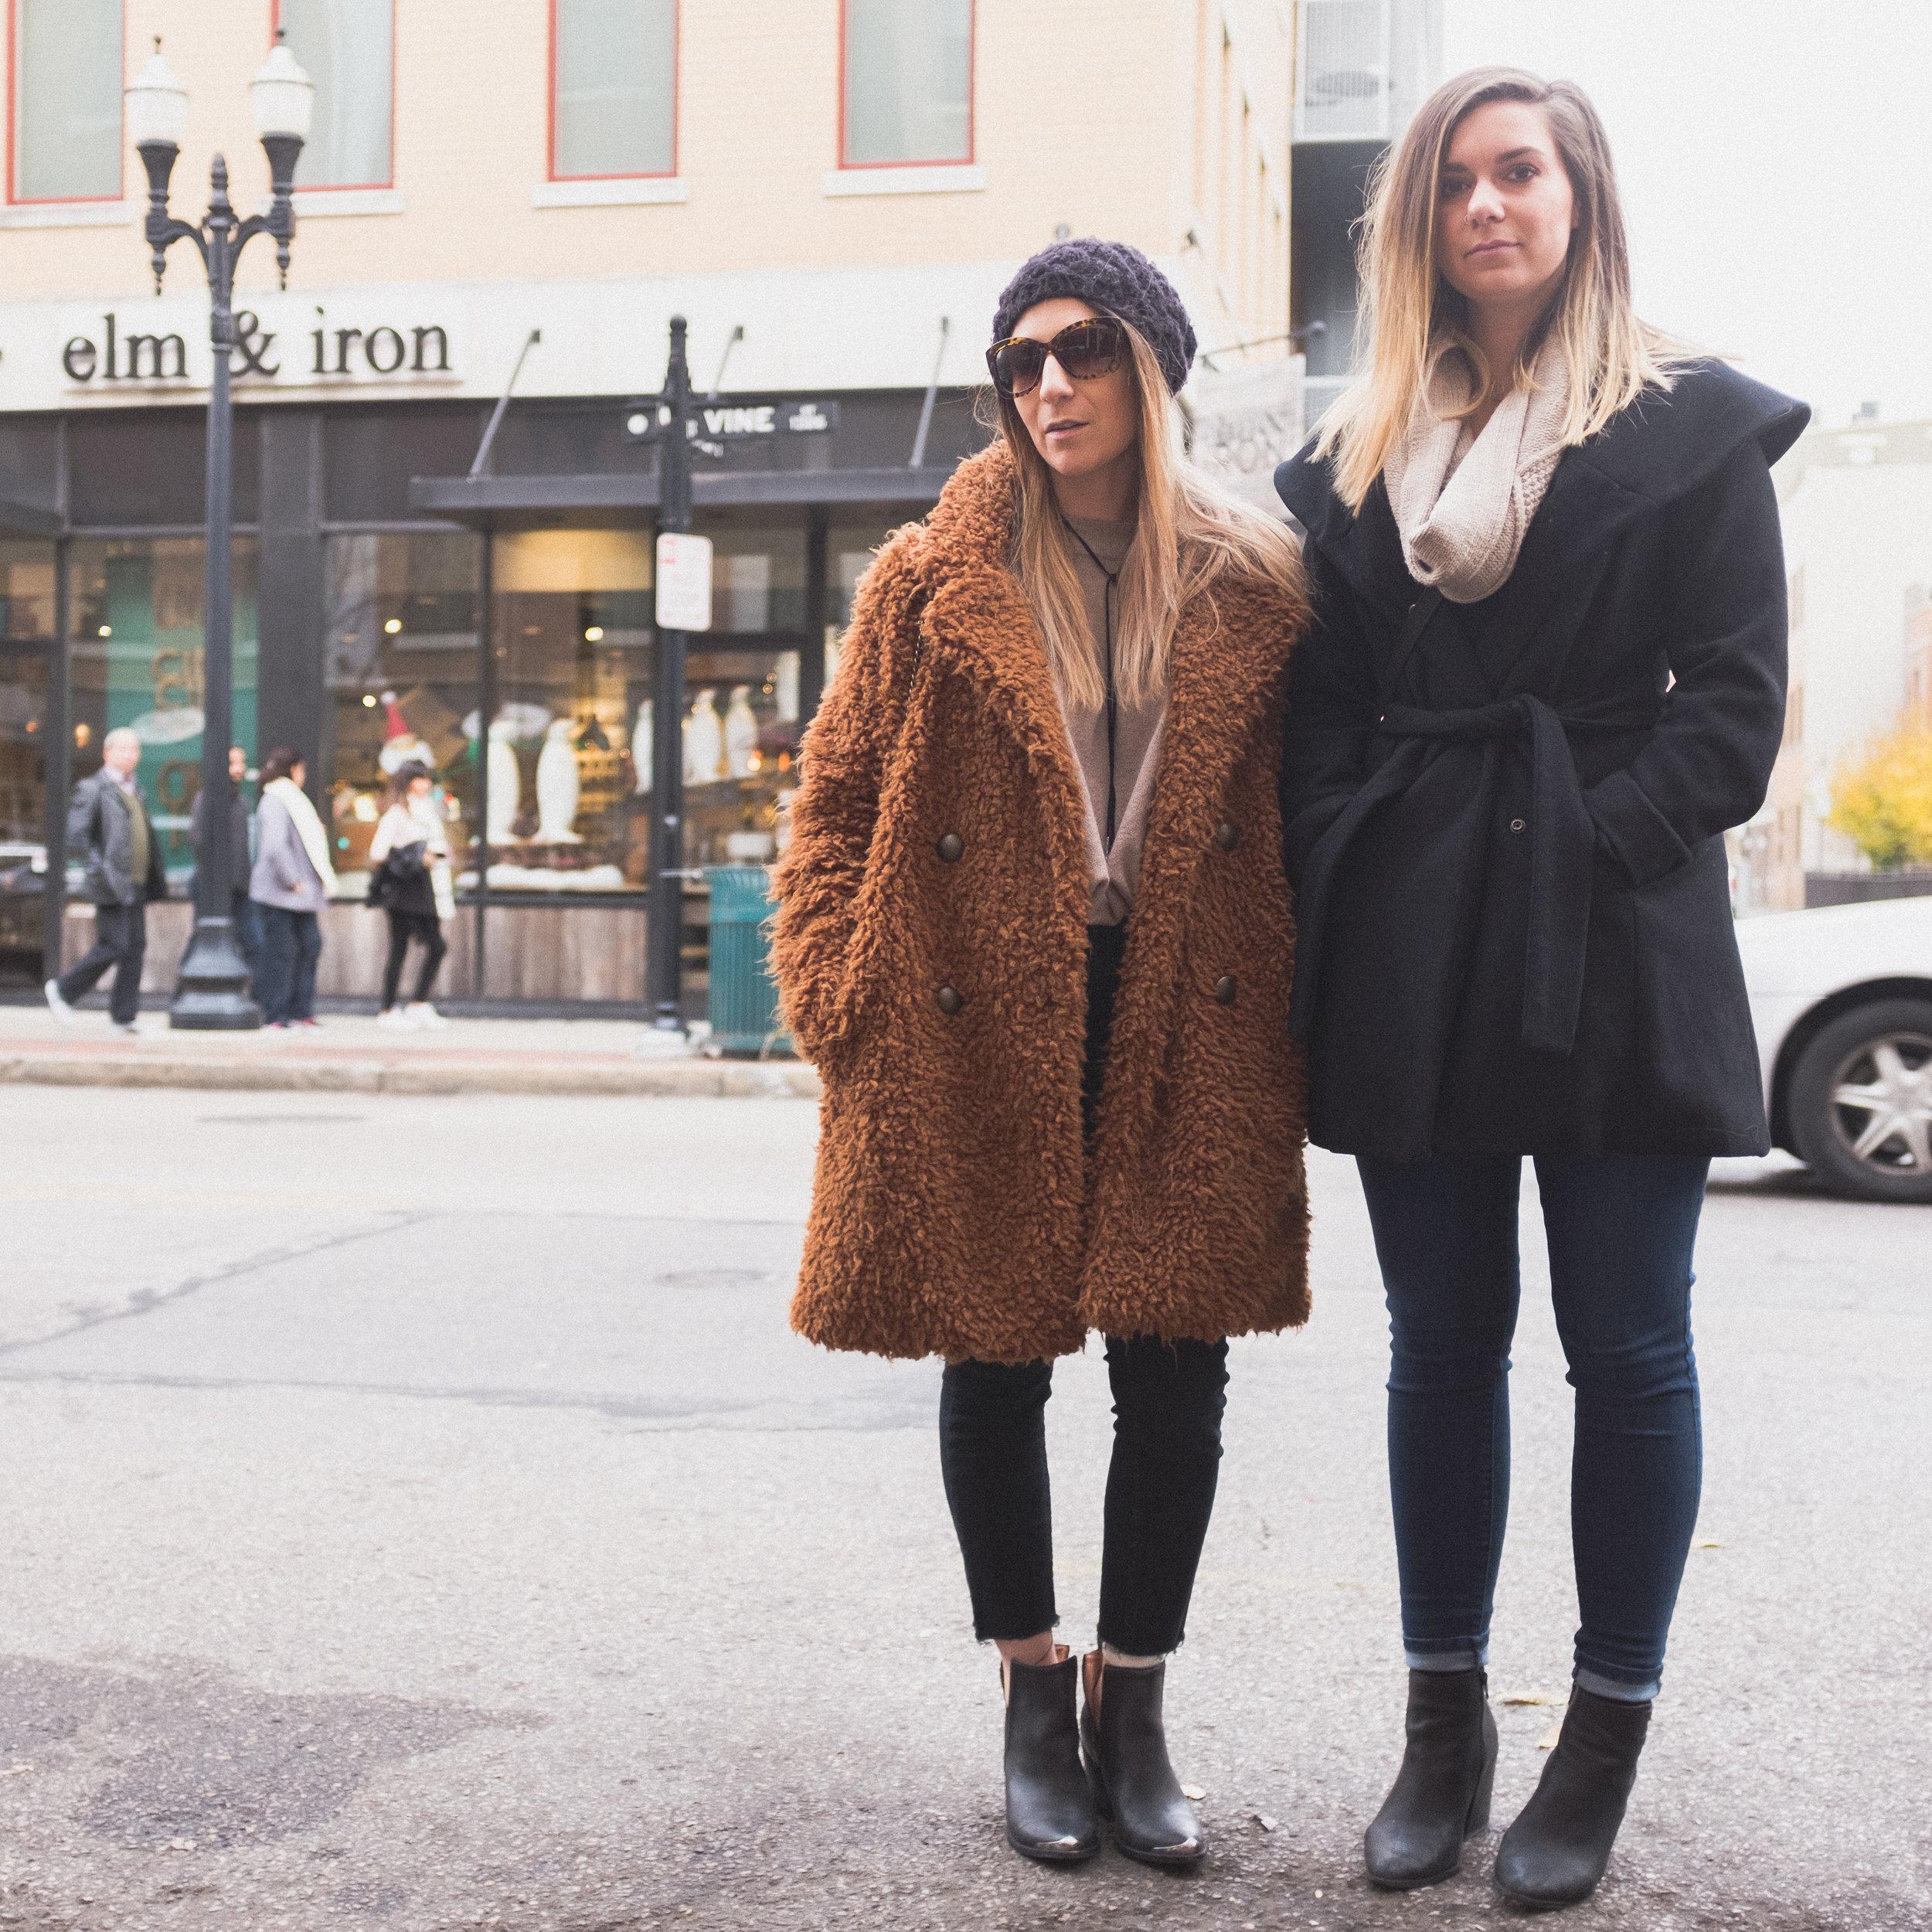 Dakotah and Jordan running the streets looking cute and cozy.